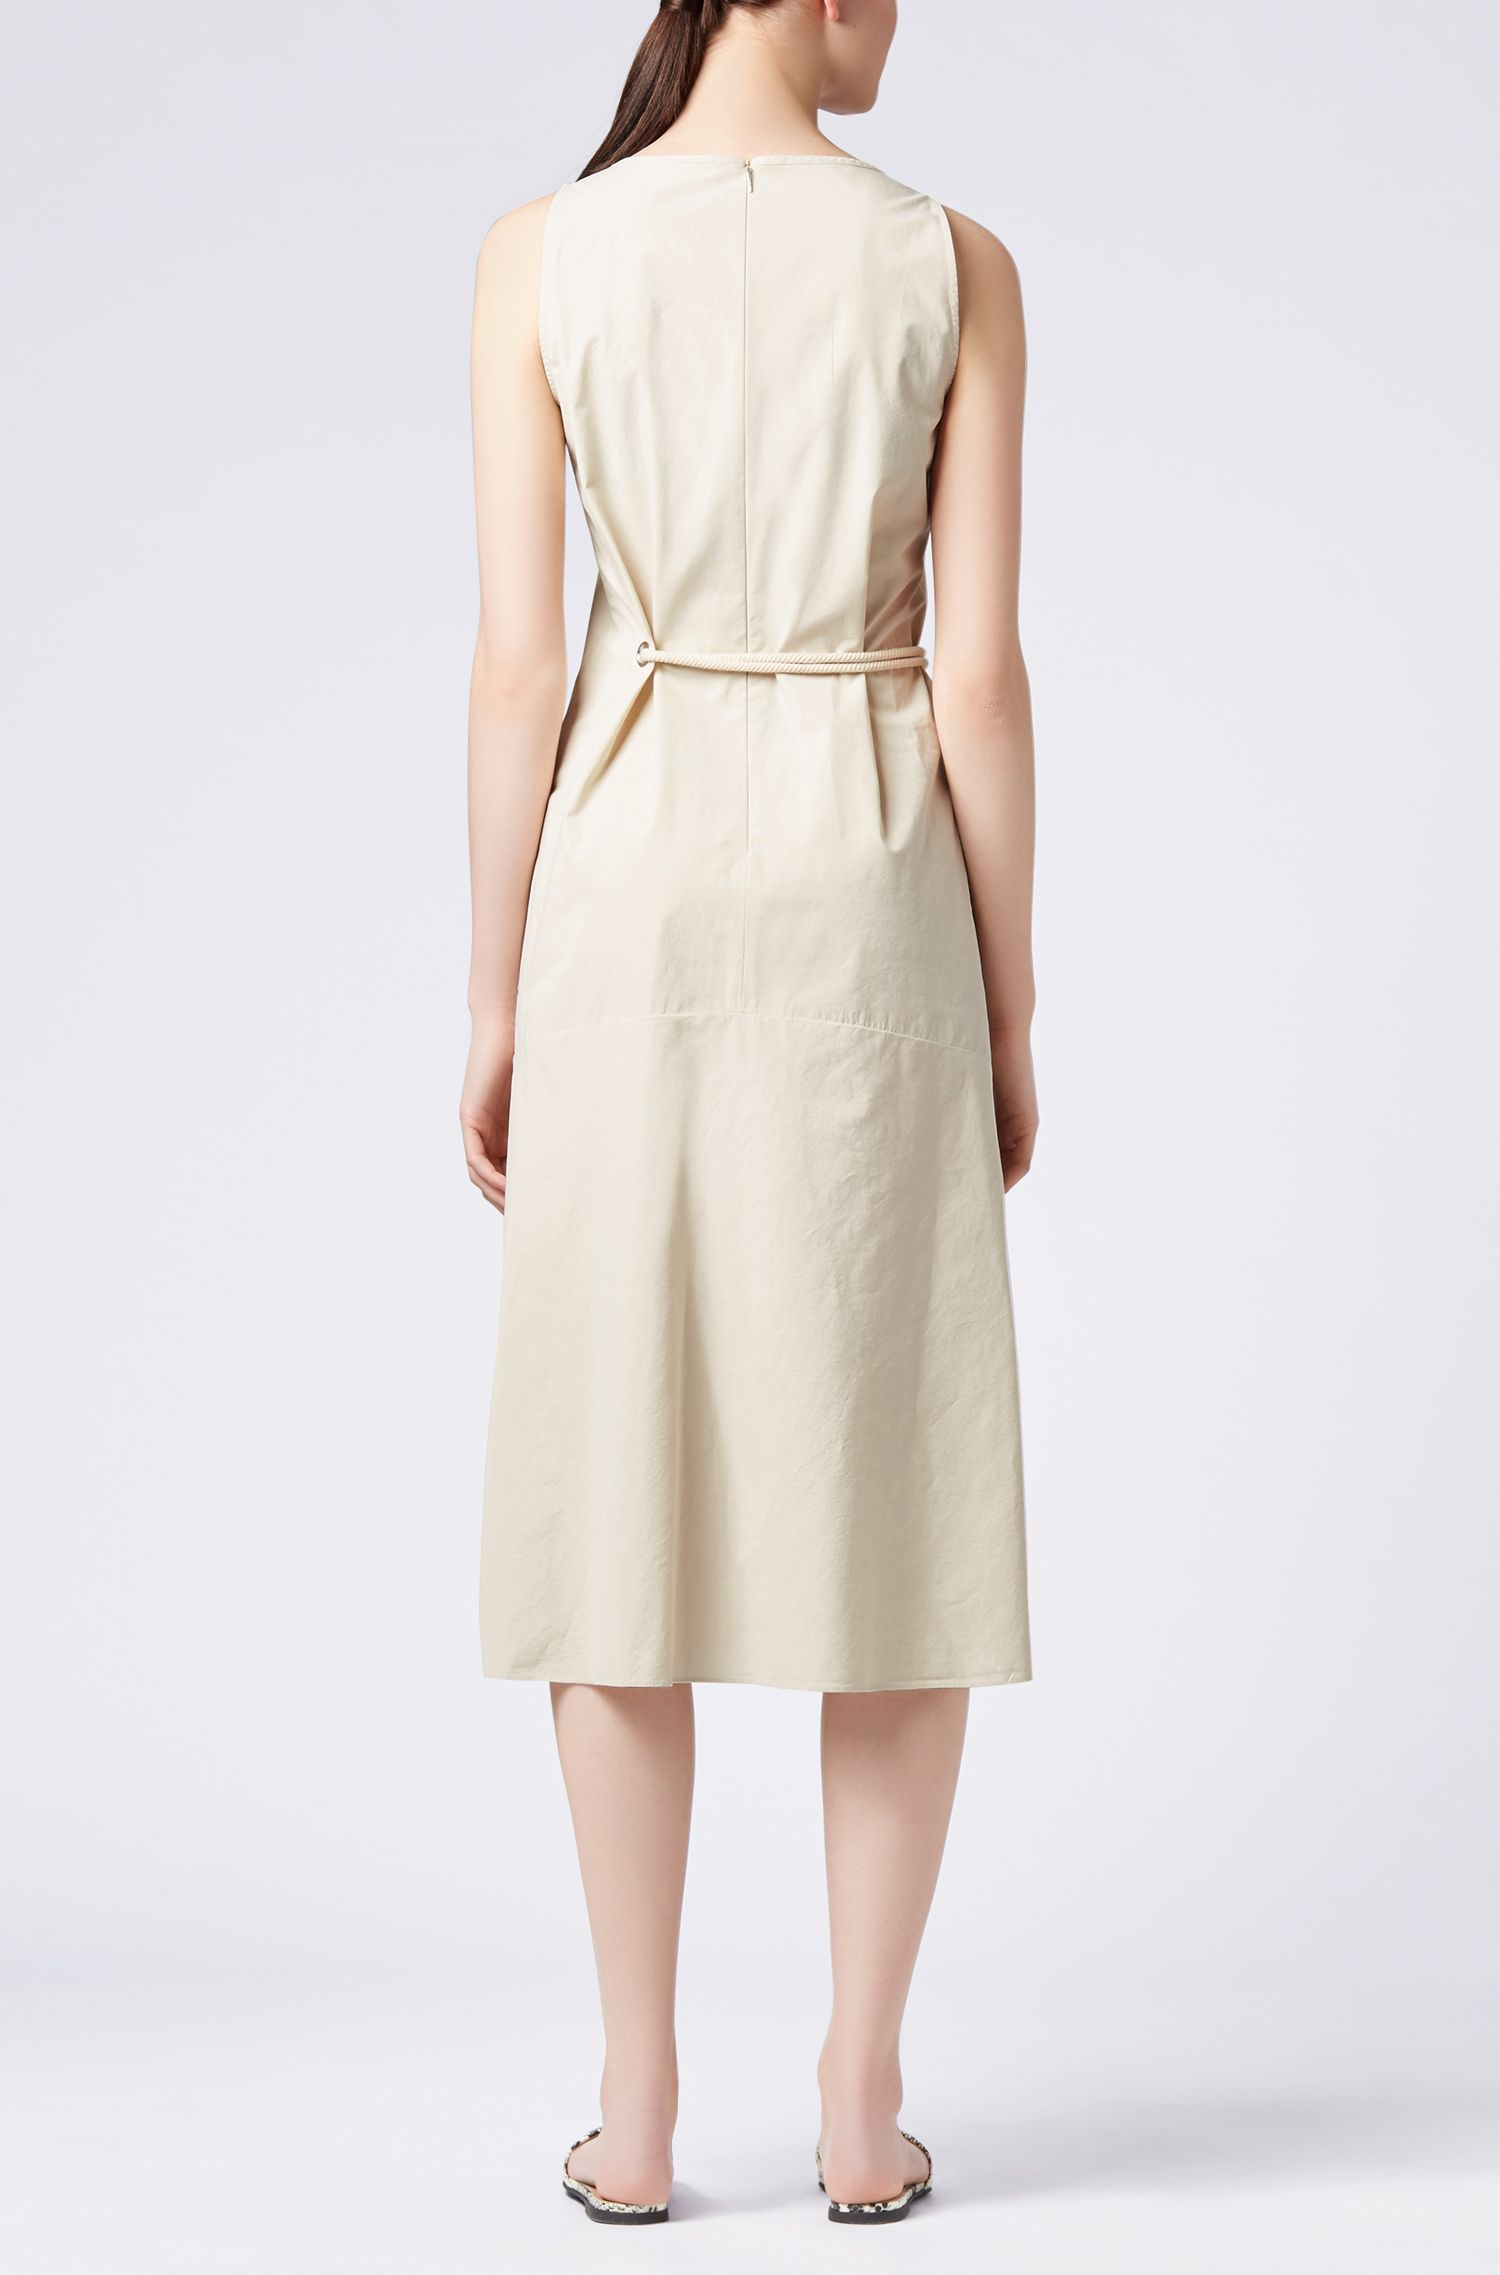 Cotton-blend dress with volant detail